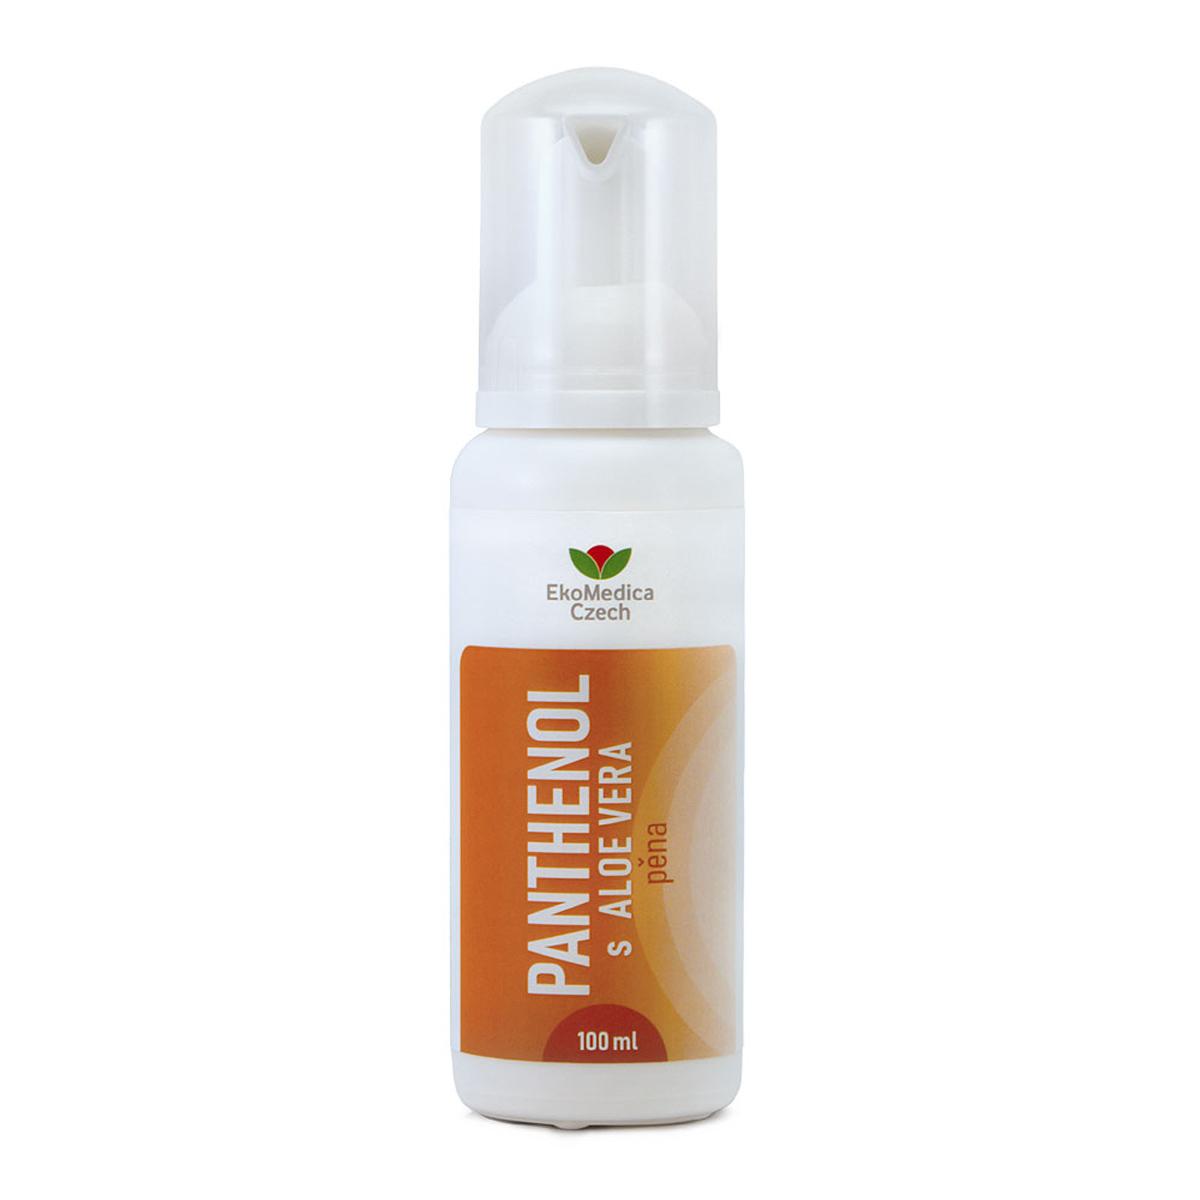 EkoMedica Panthenol s Aloe Vera pěna 100 ml